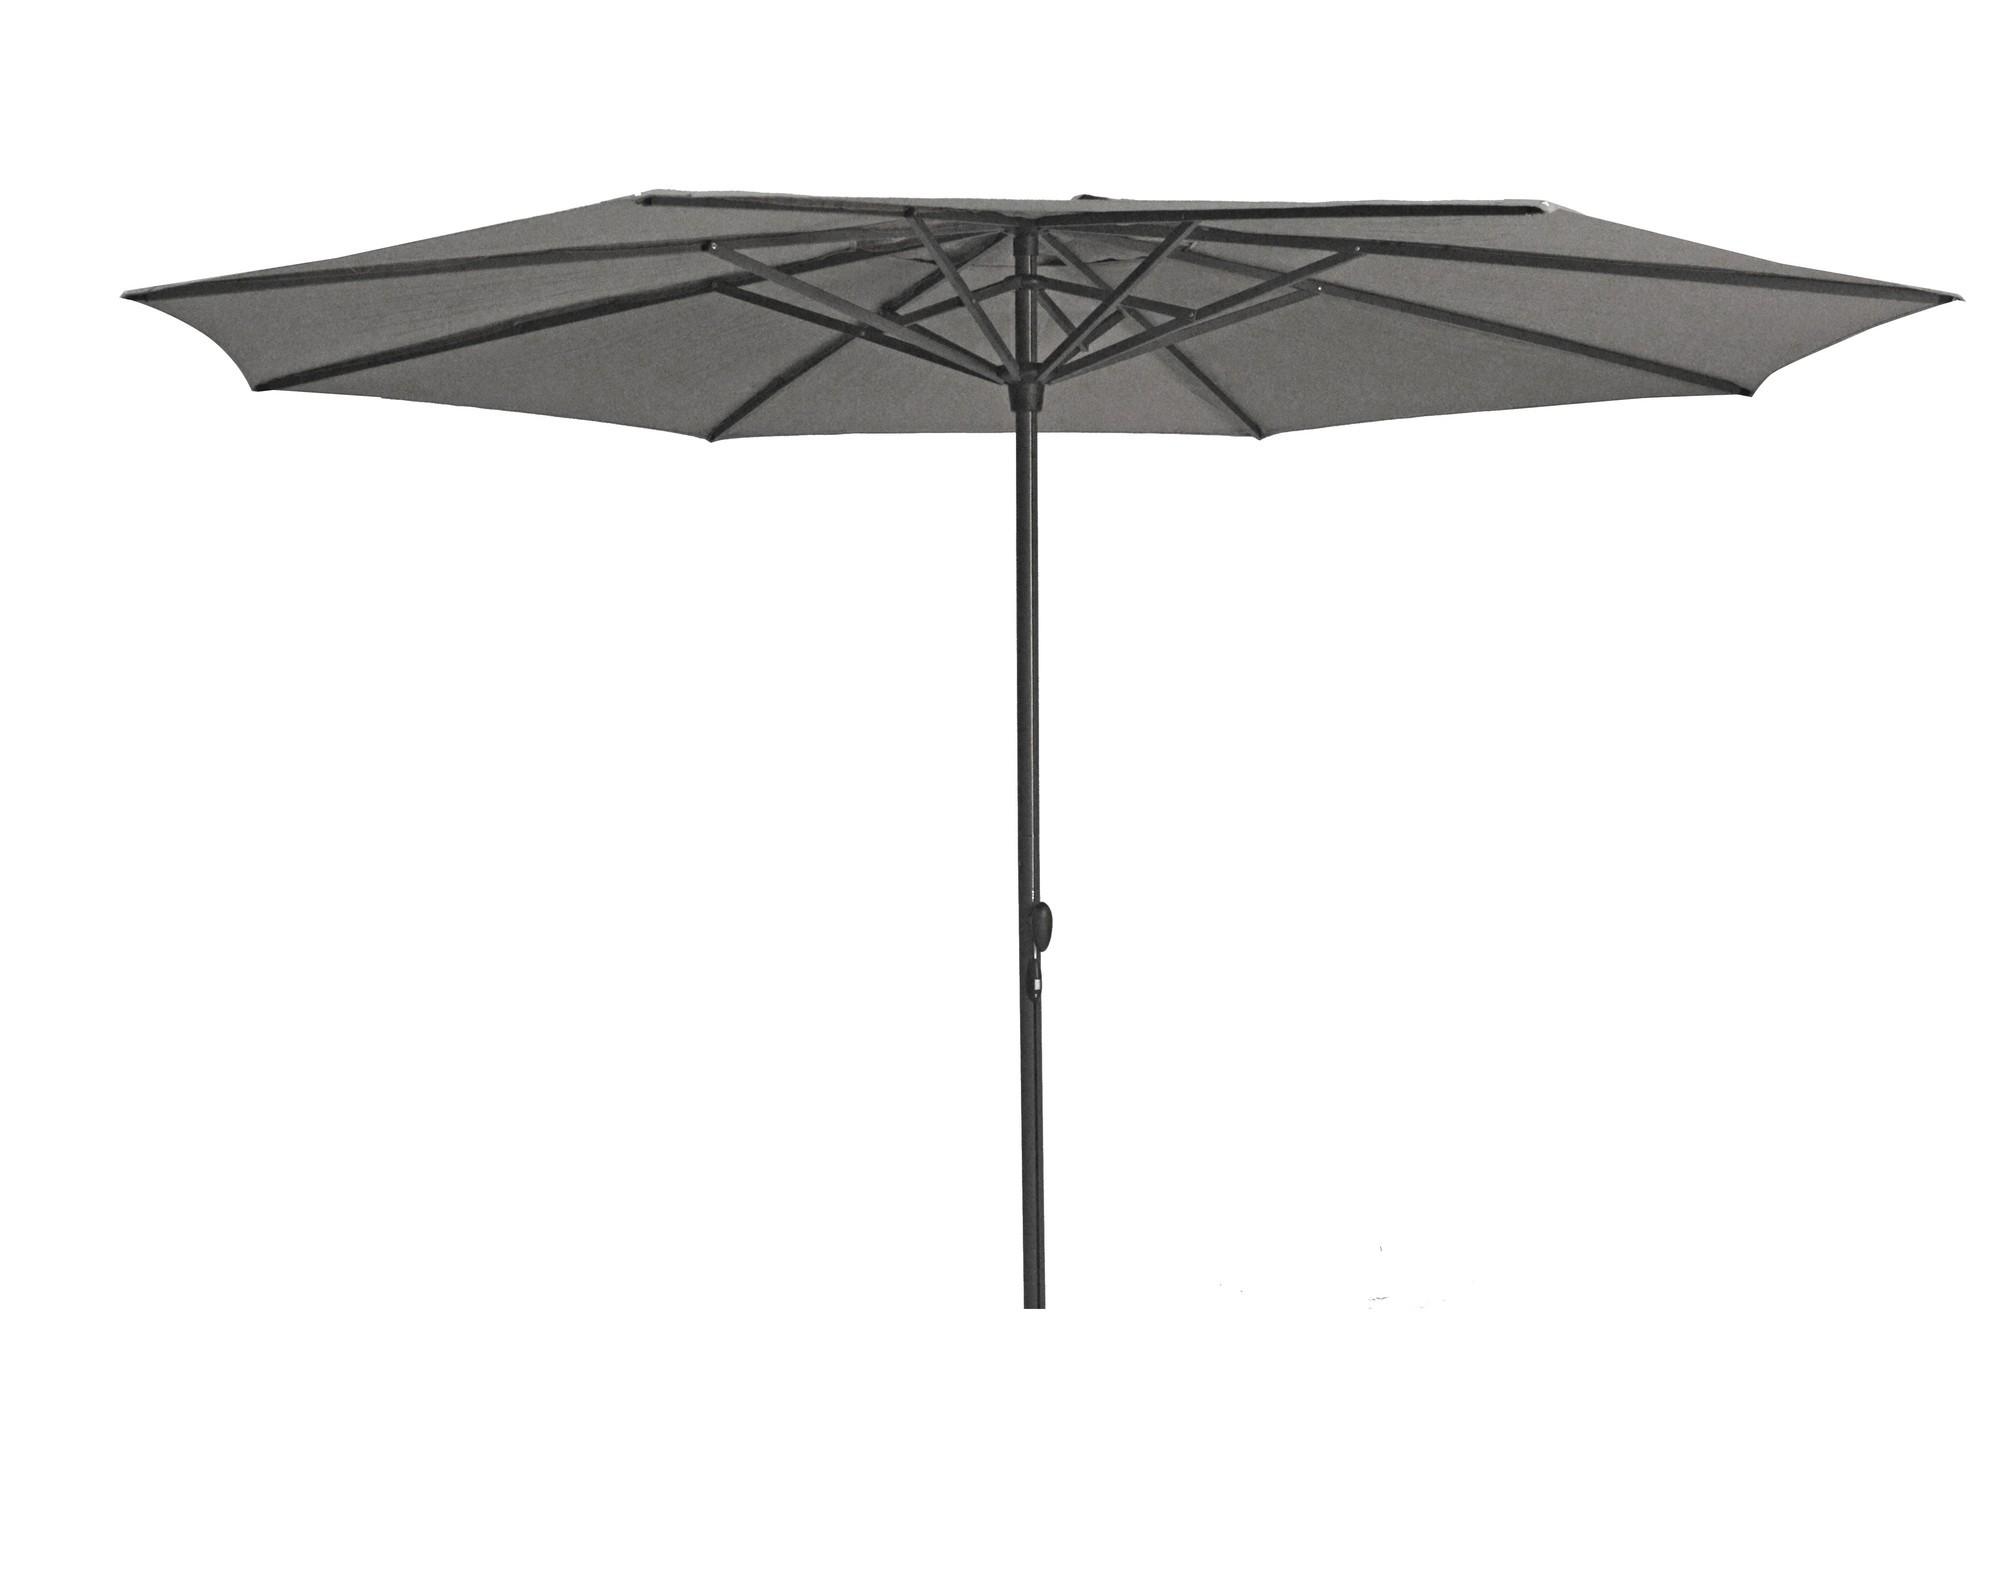 Stokparasol Sintra parasol dia 330 cm donkergrijs